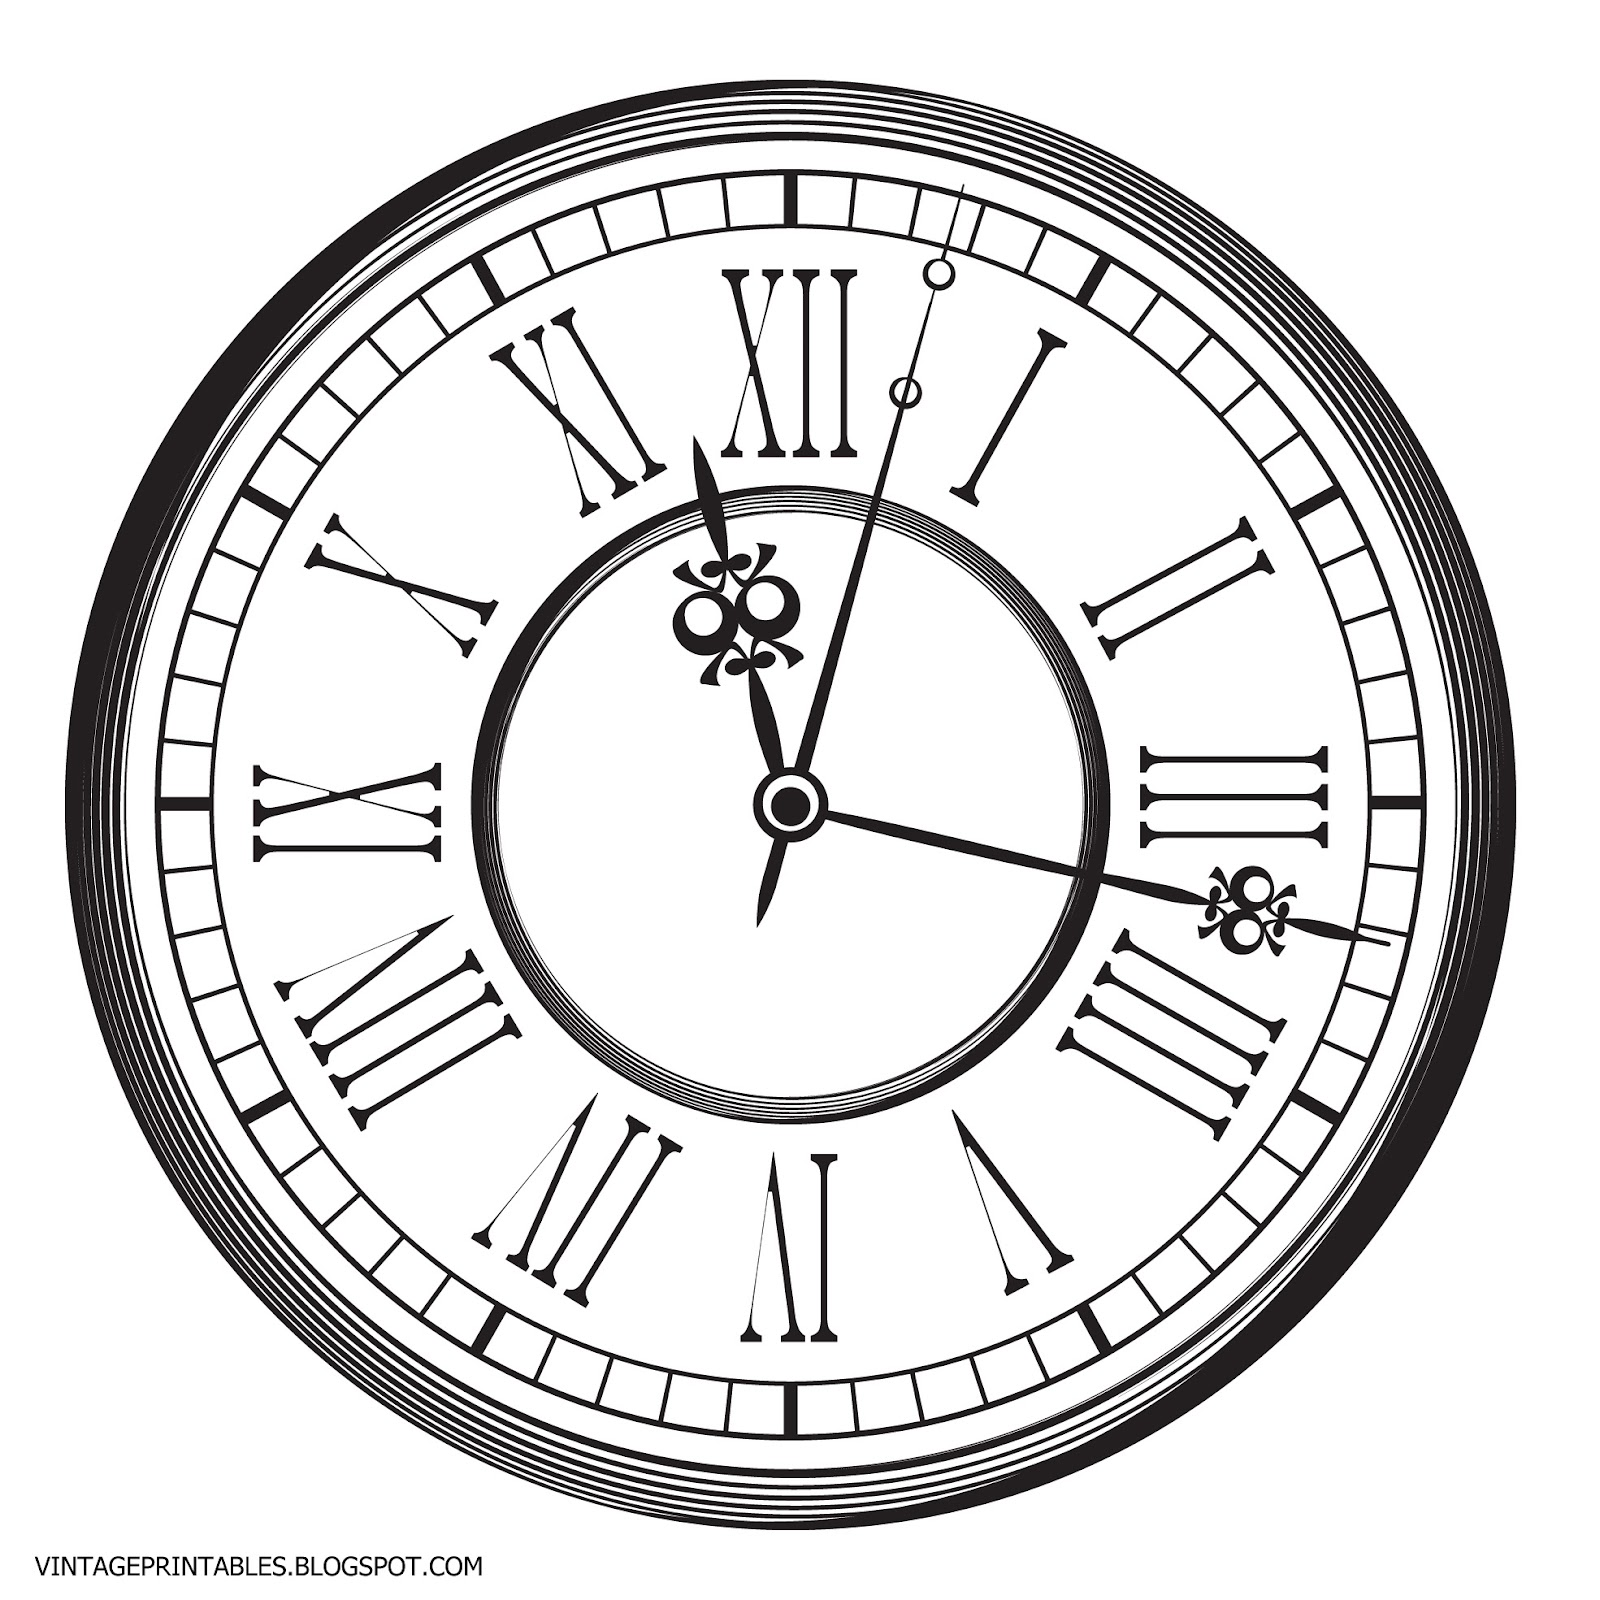 1600x1600 Free Vintage Clip Art Images Old Antique Clock Free Clip Art